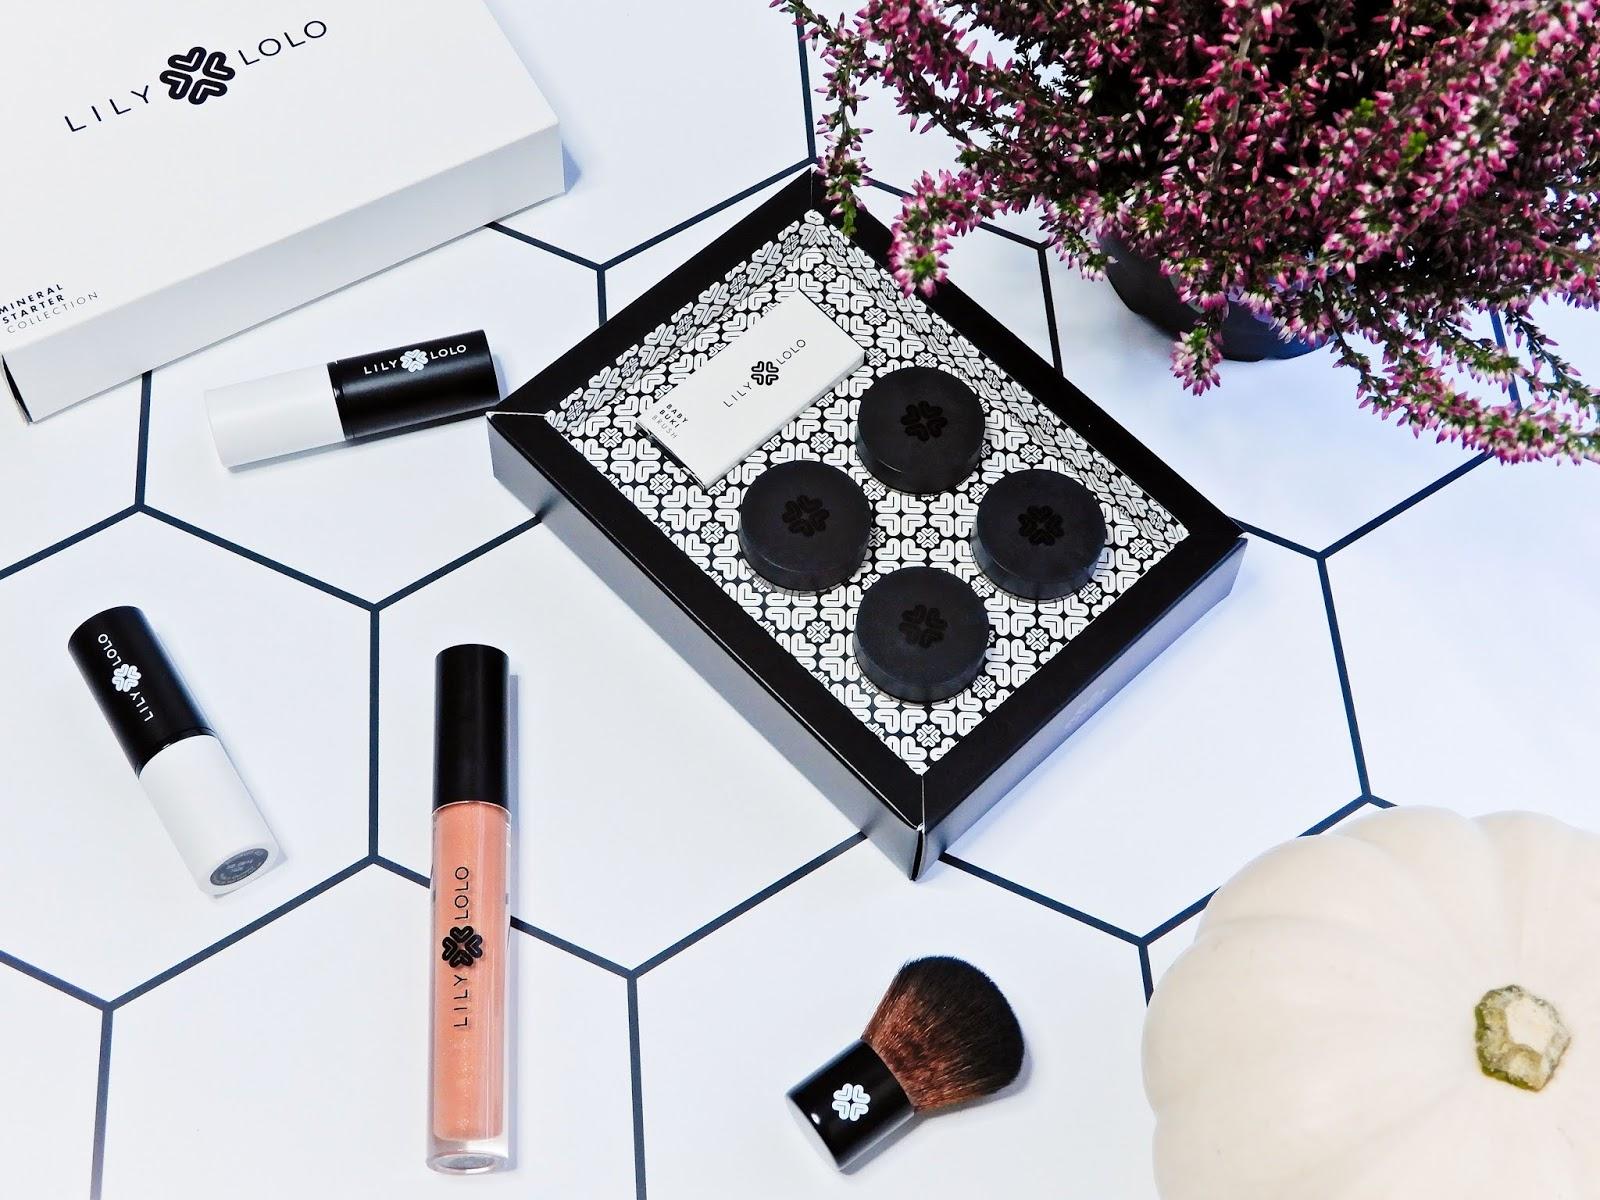 Lily Lolo Mineral Makeup | Naturalne szminki, błyszczyk & Mineral Starter